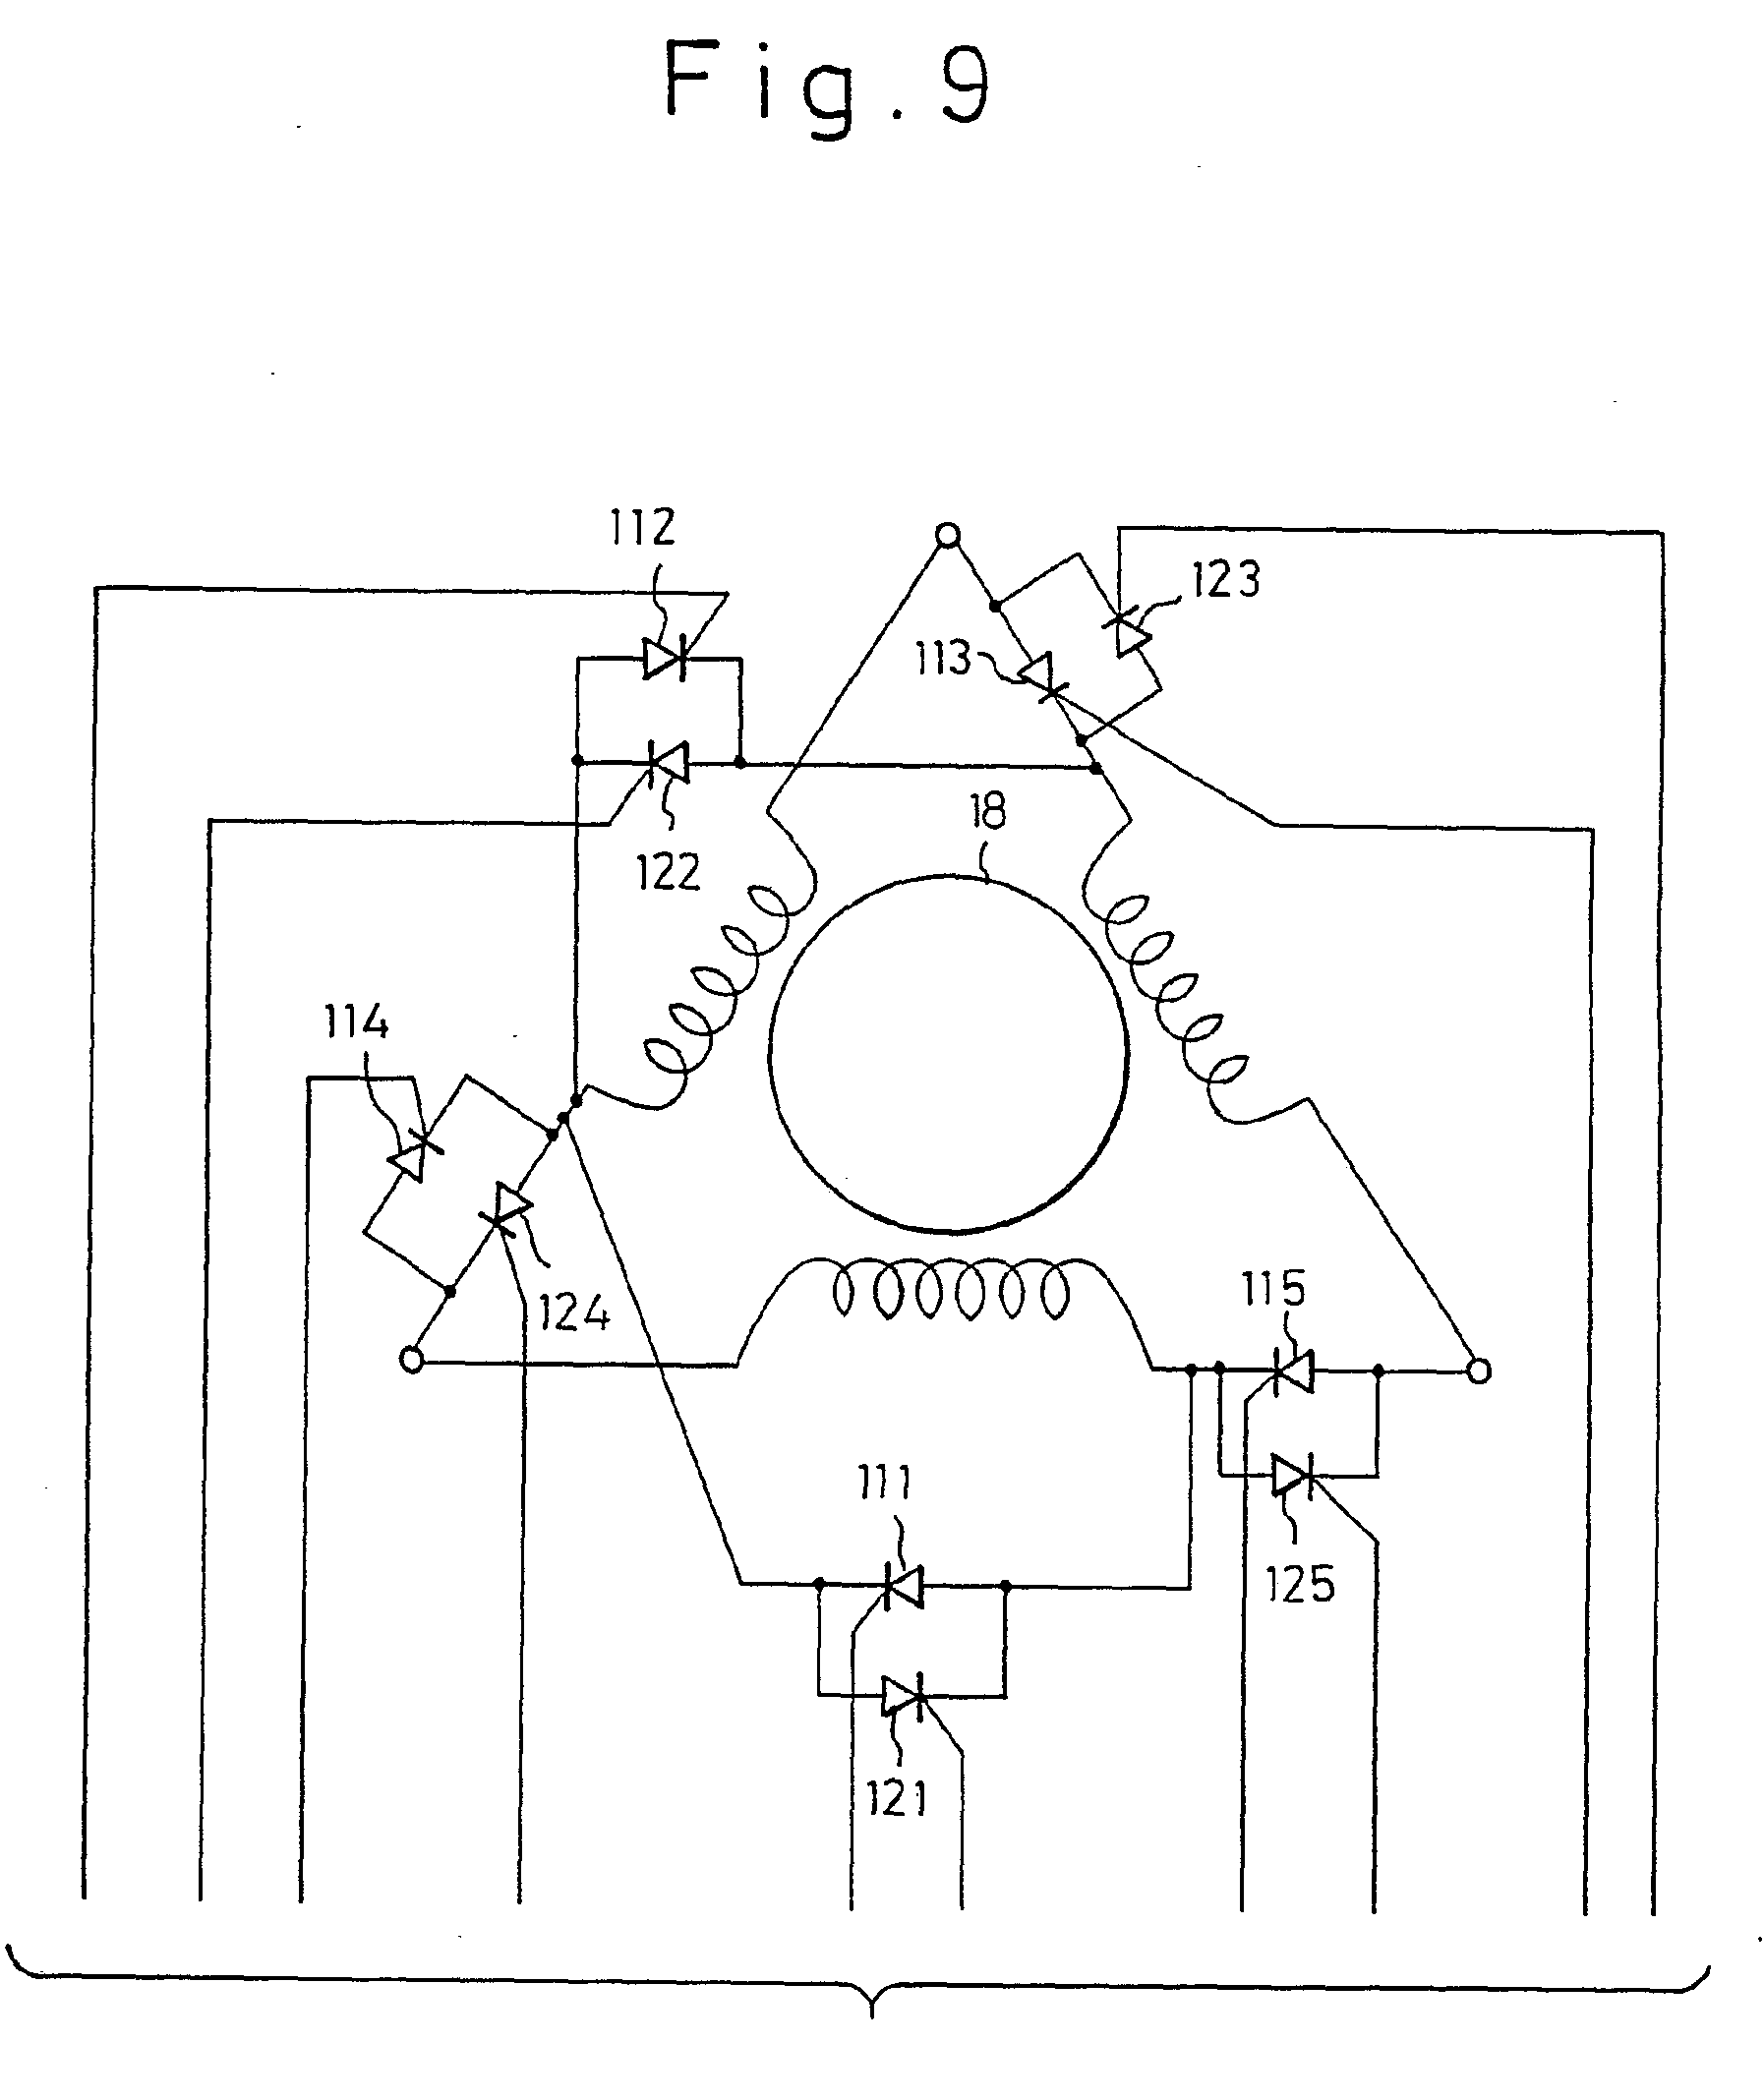 induction motor diagram